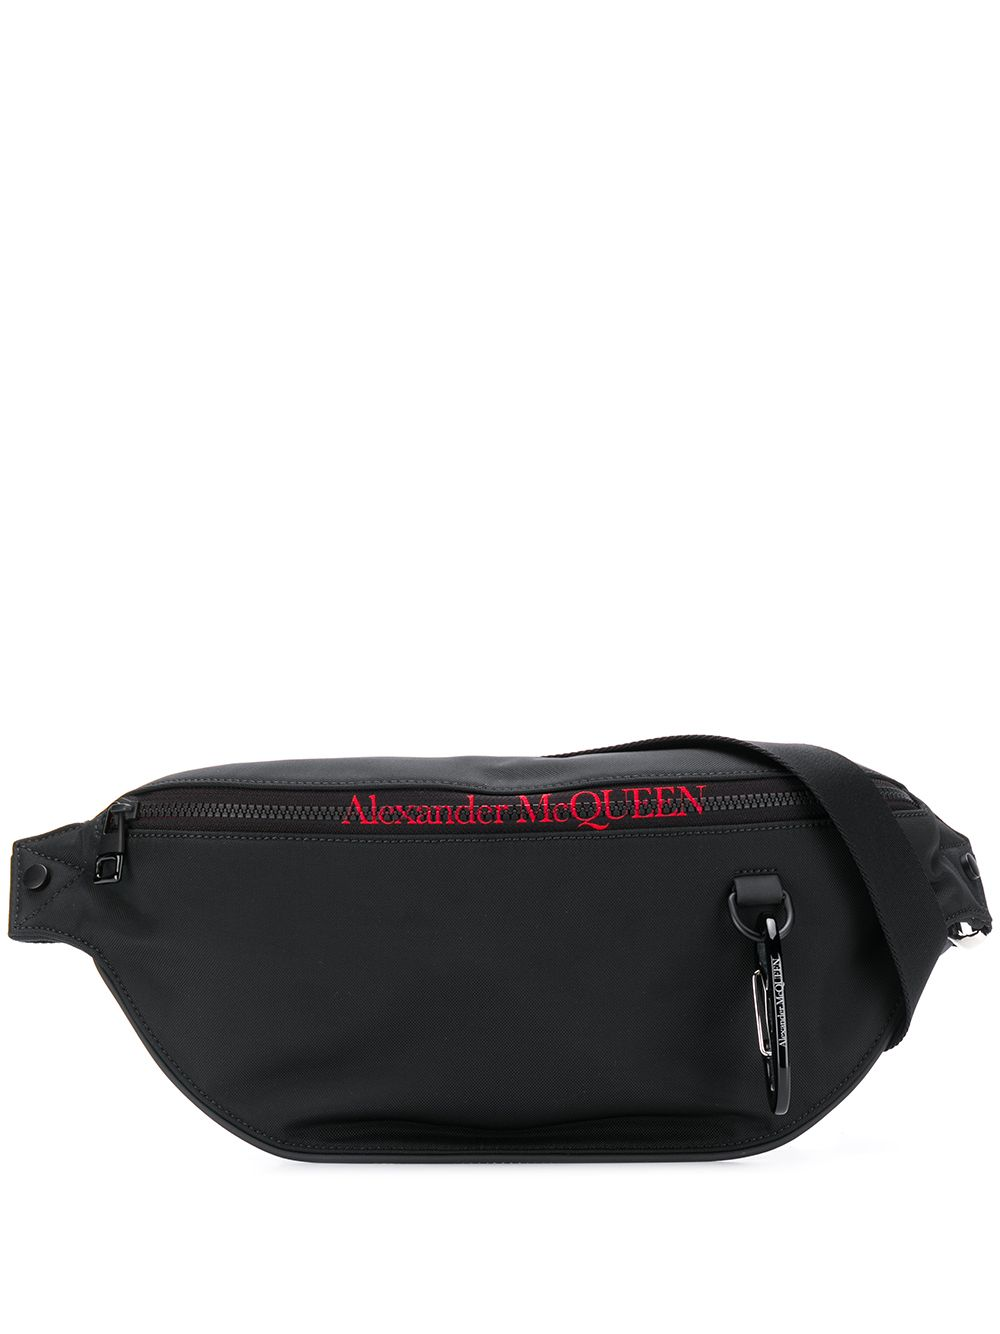 Harness Oversized Beltbag